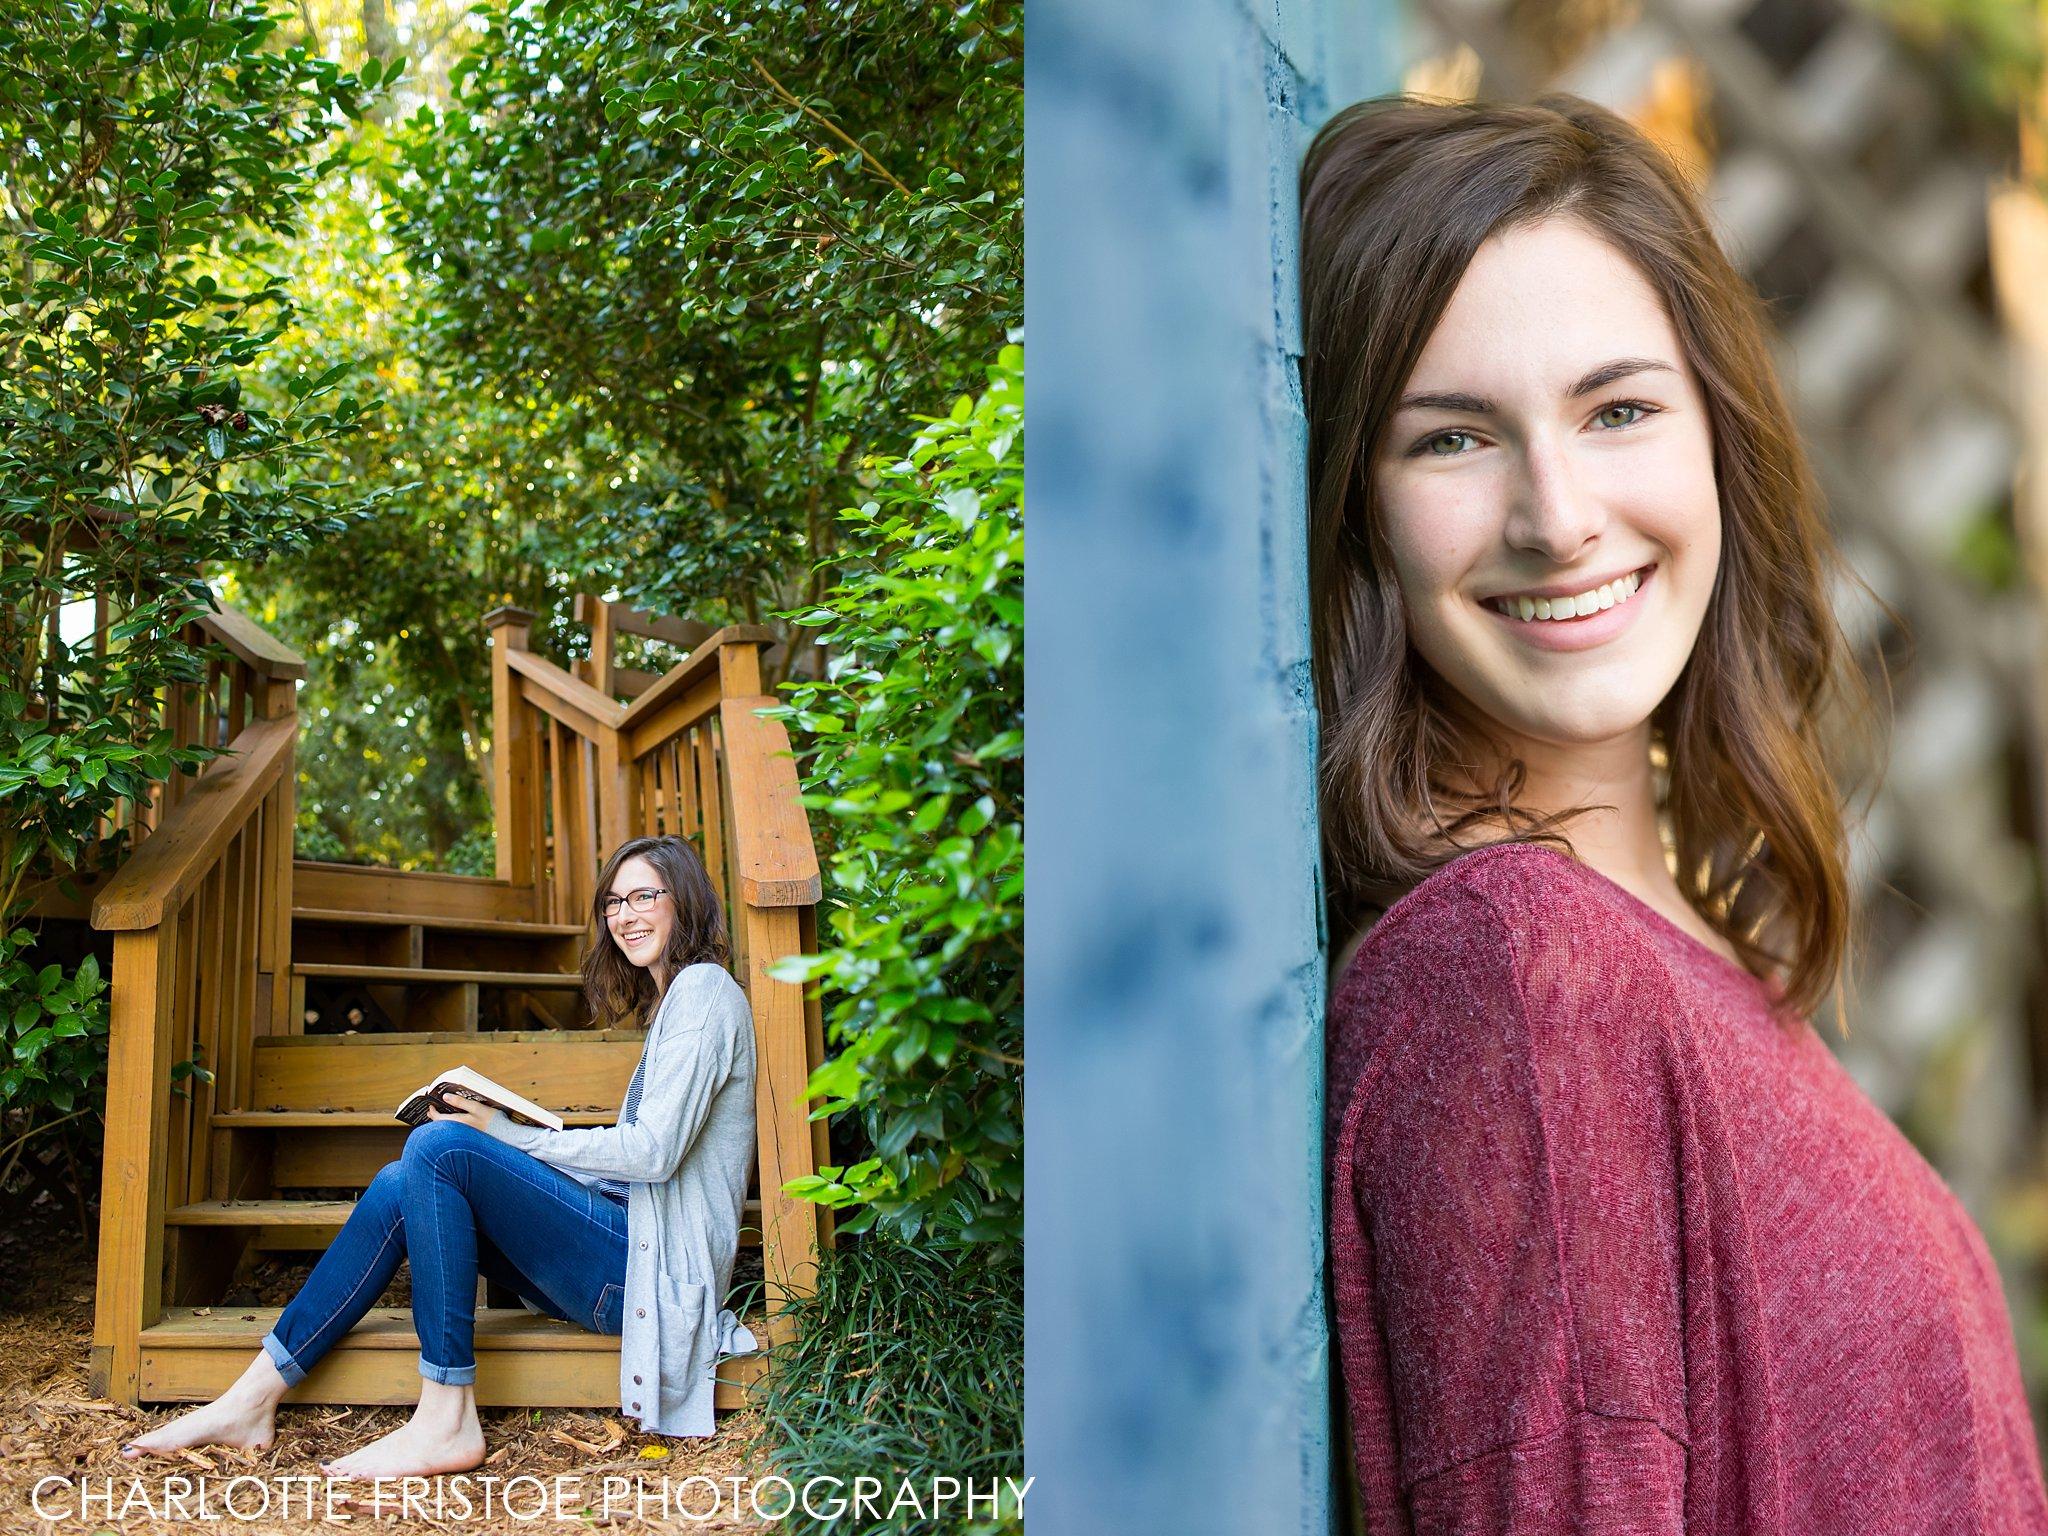 Charlotte Fristoe Photography Senior Pictures-5.jpg